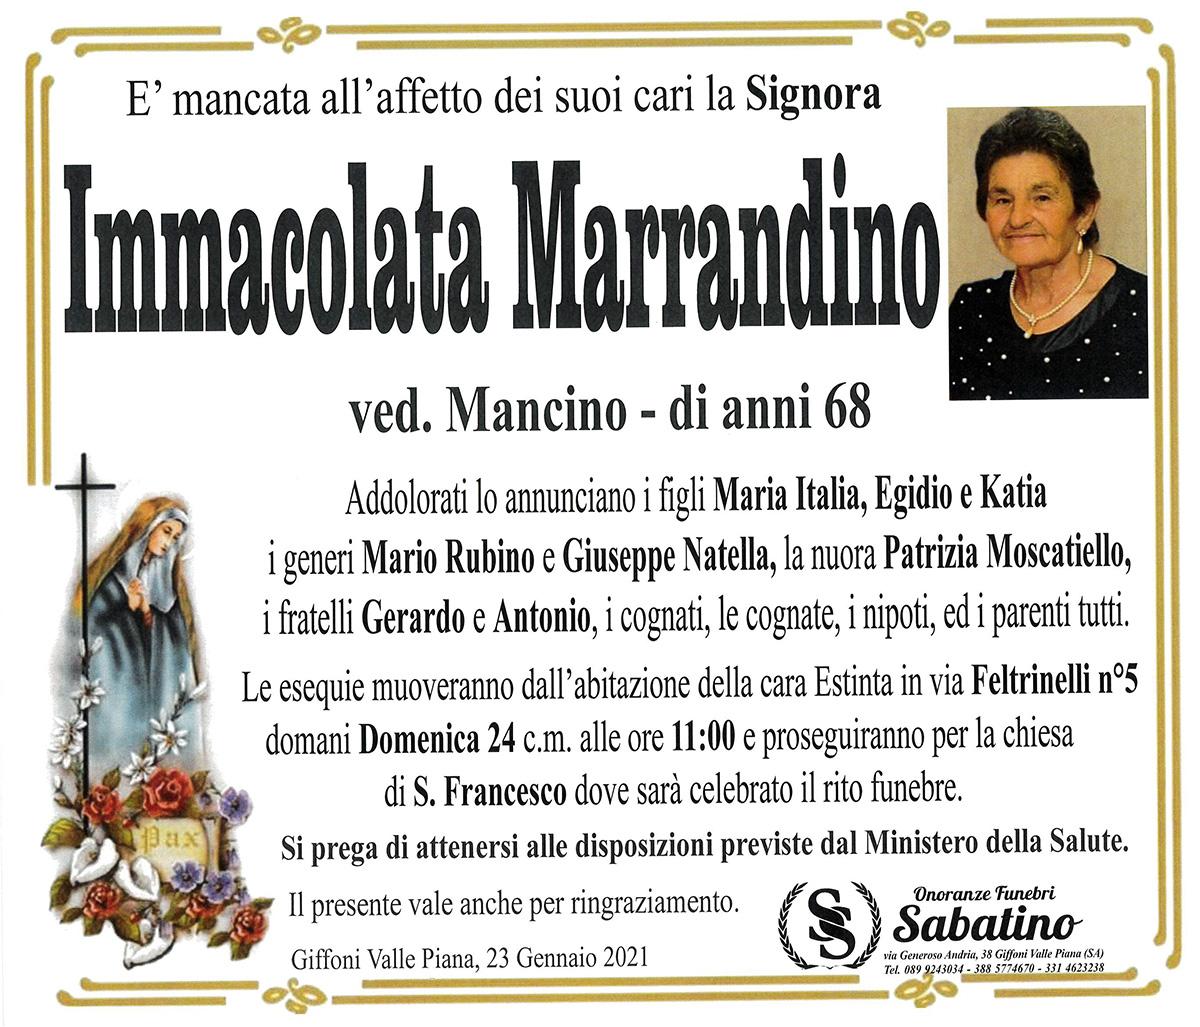 Immacolata Marrandino